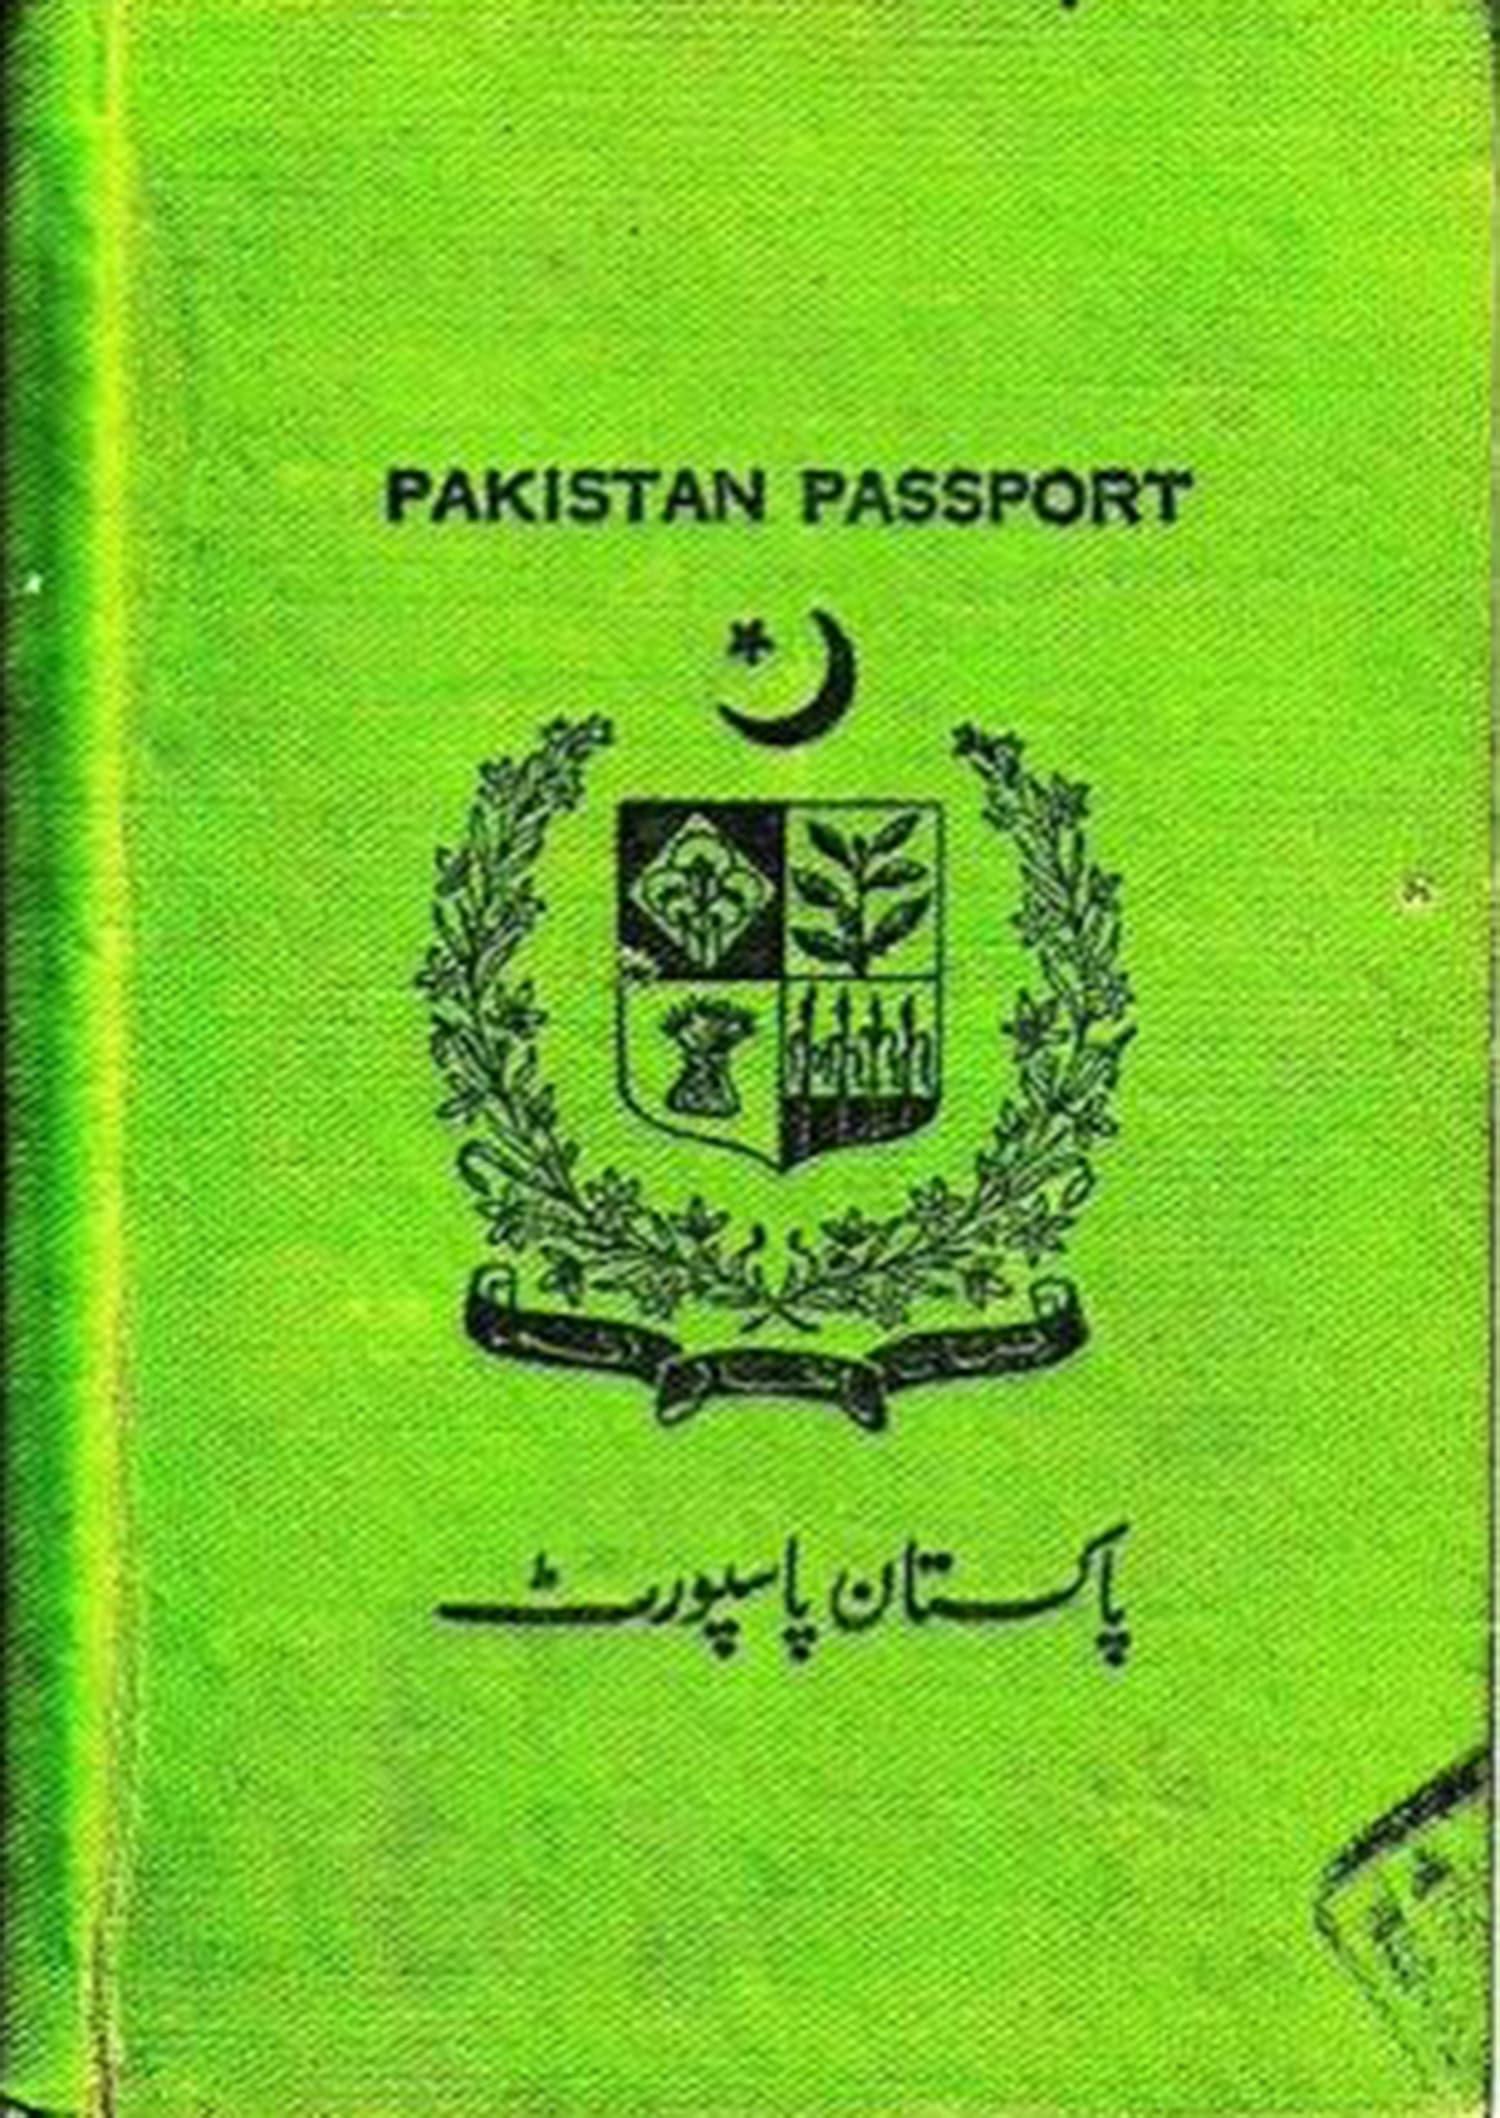 Pakistani passport during Ayub's era